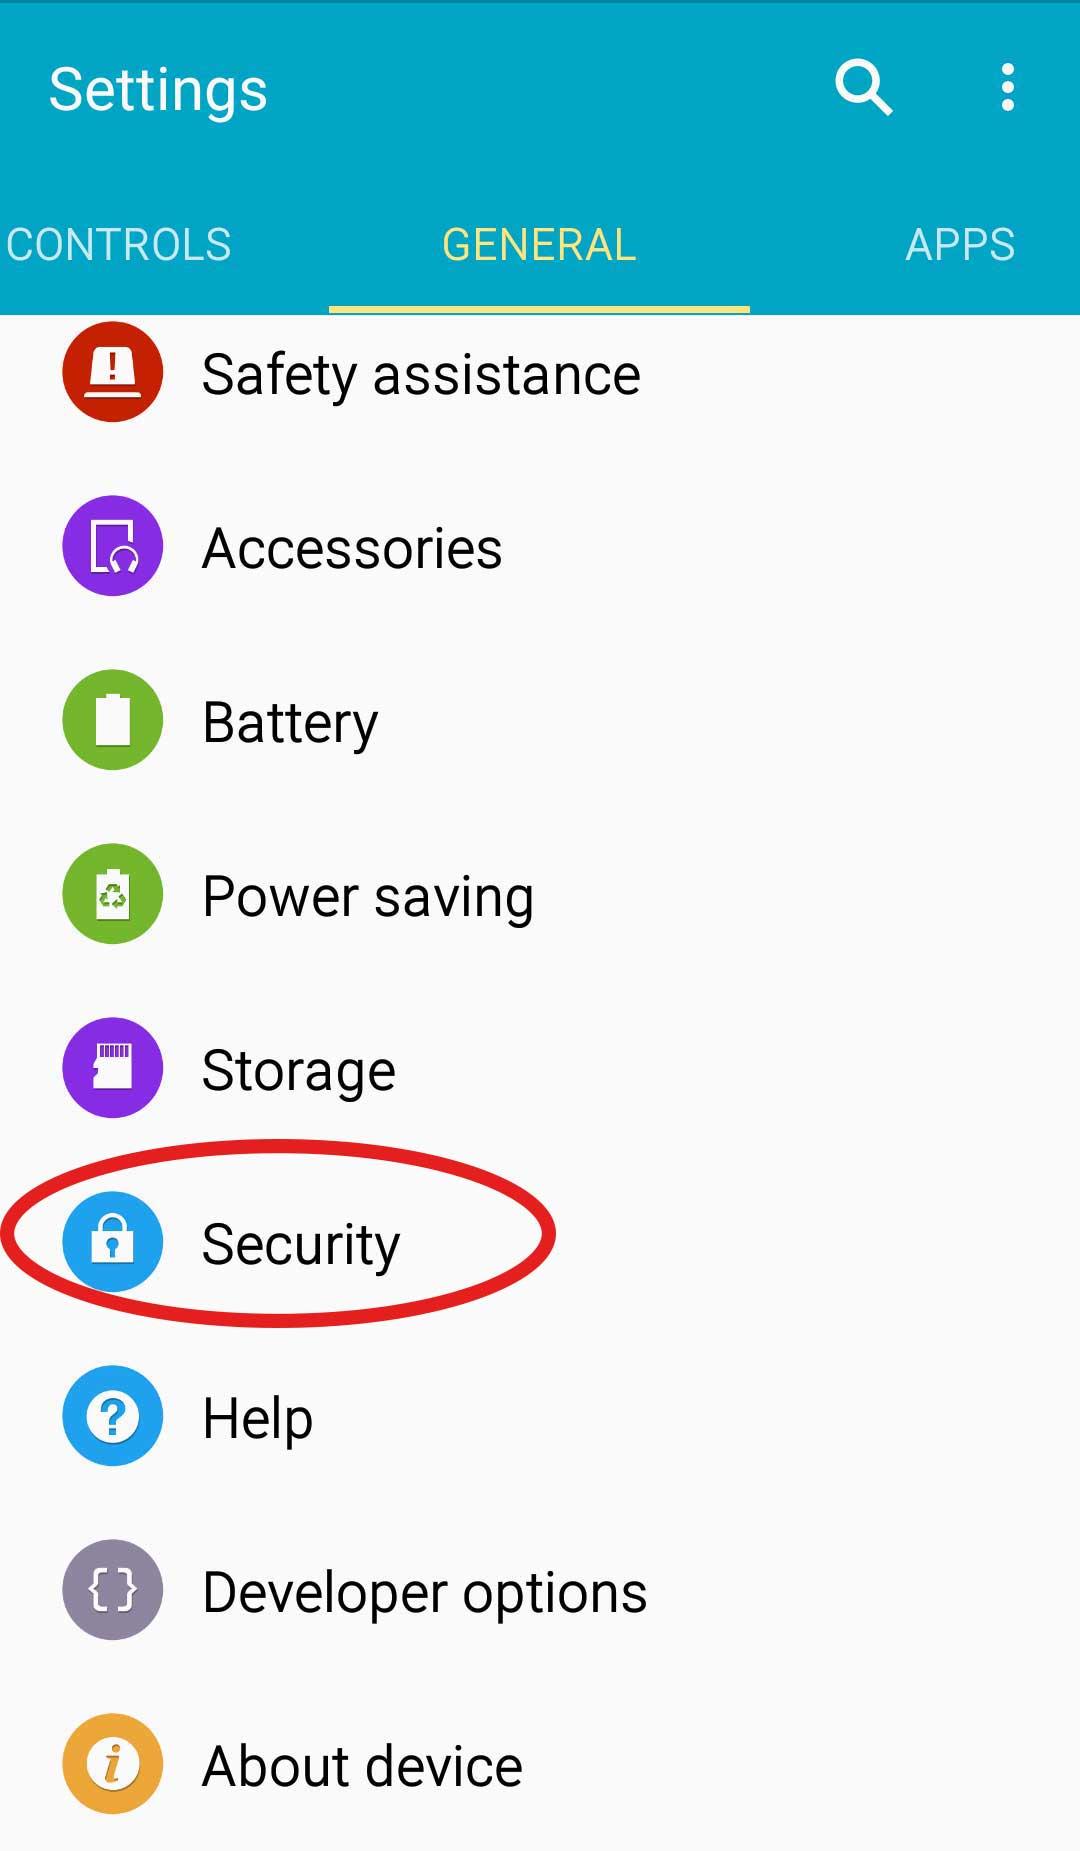 Secuirty settings